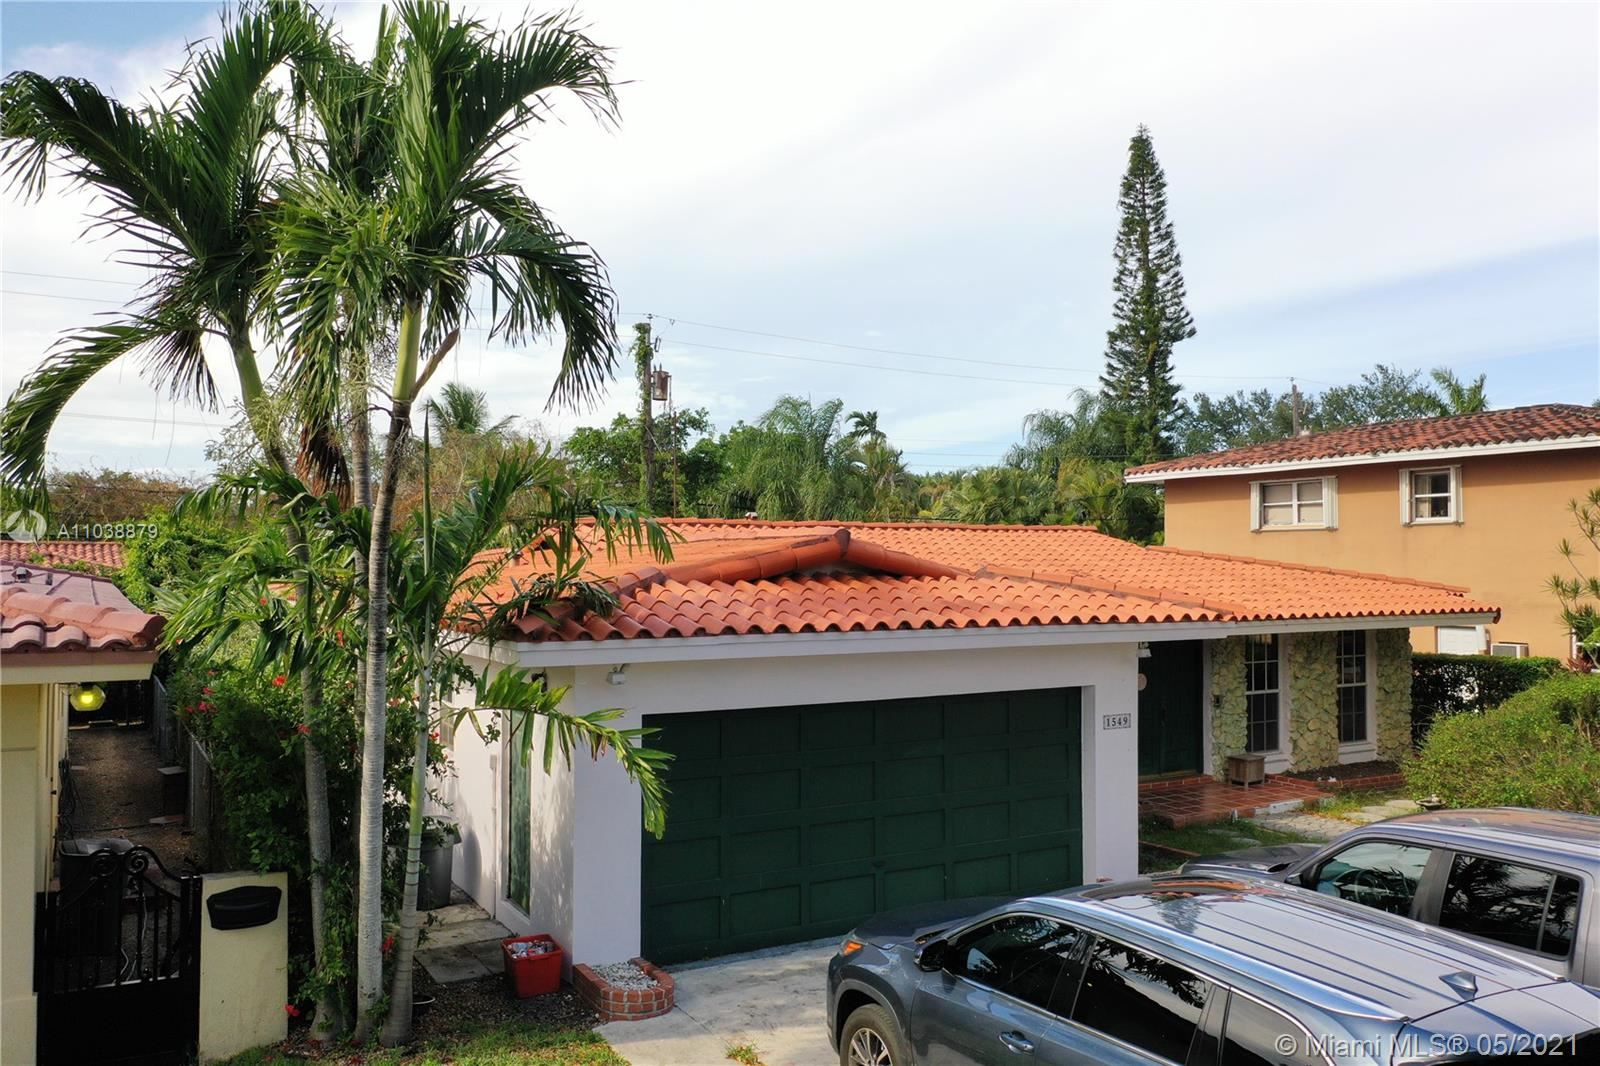 Photo of 1549 Zuleta Ave, Coral Gables, FL 33146 (MLS # A11038879)